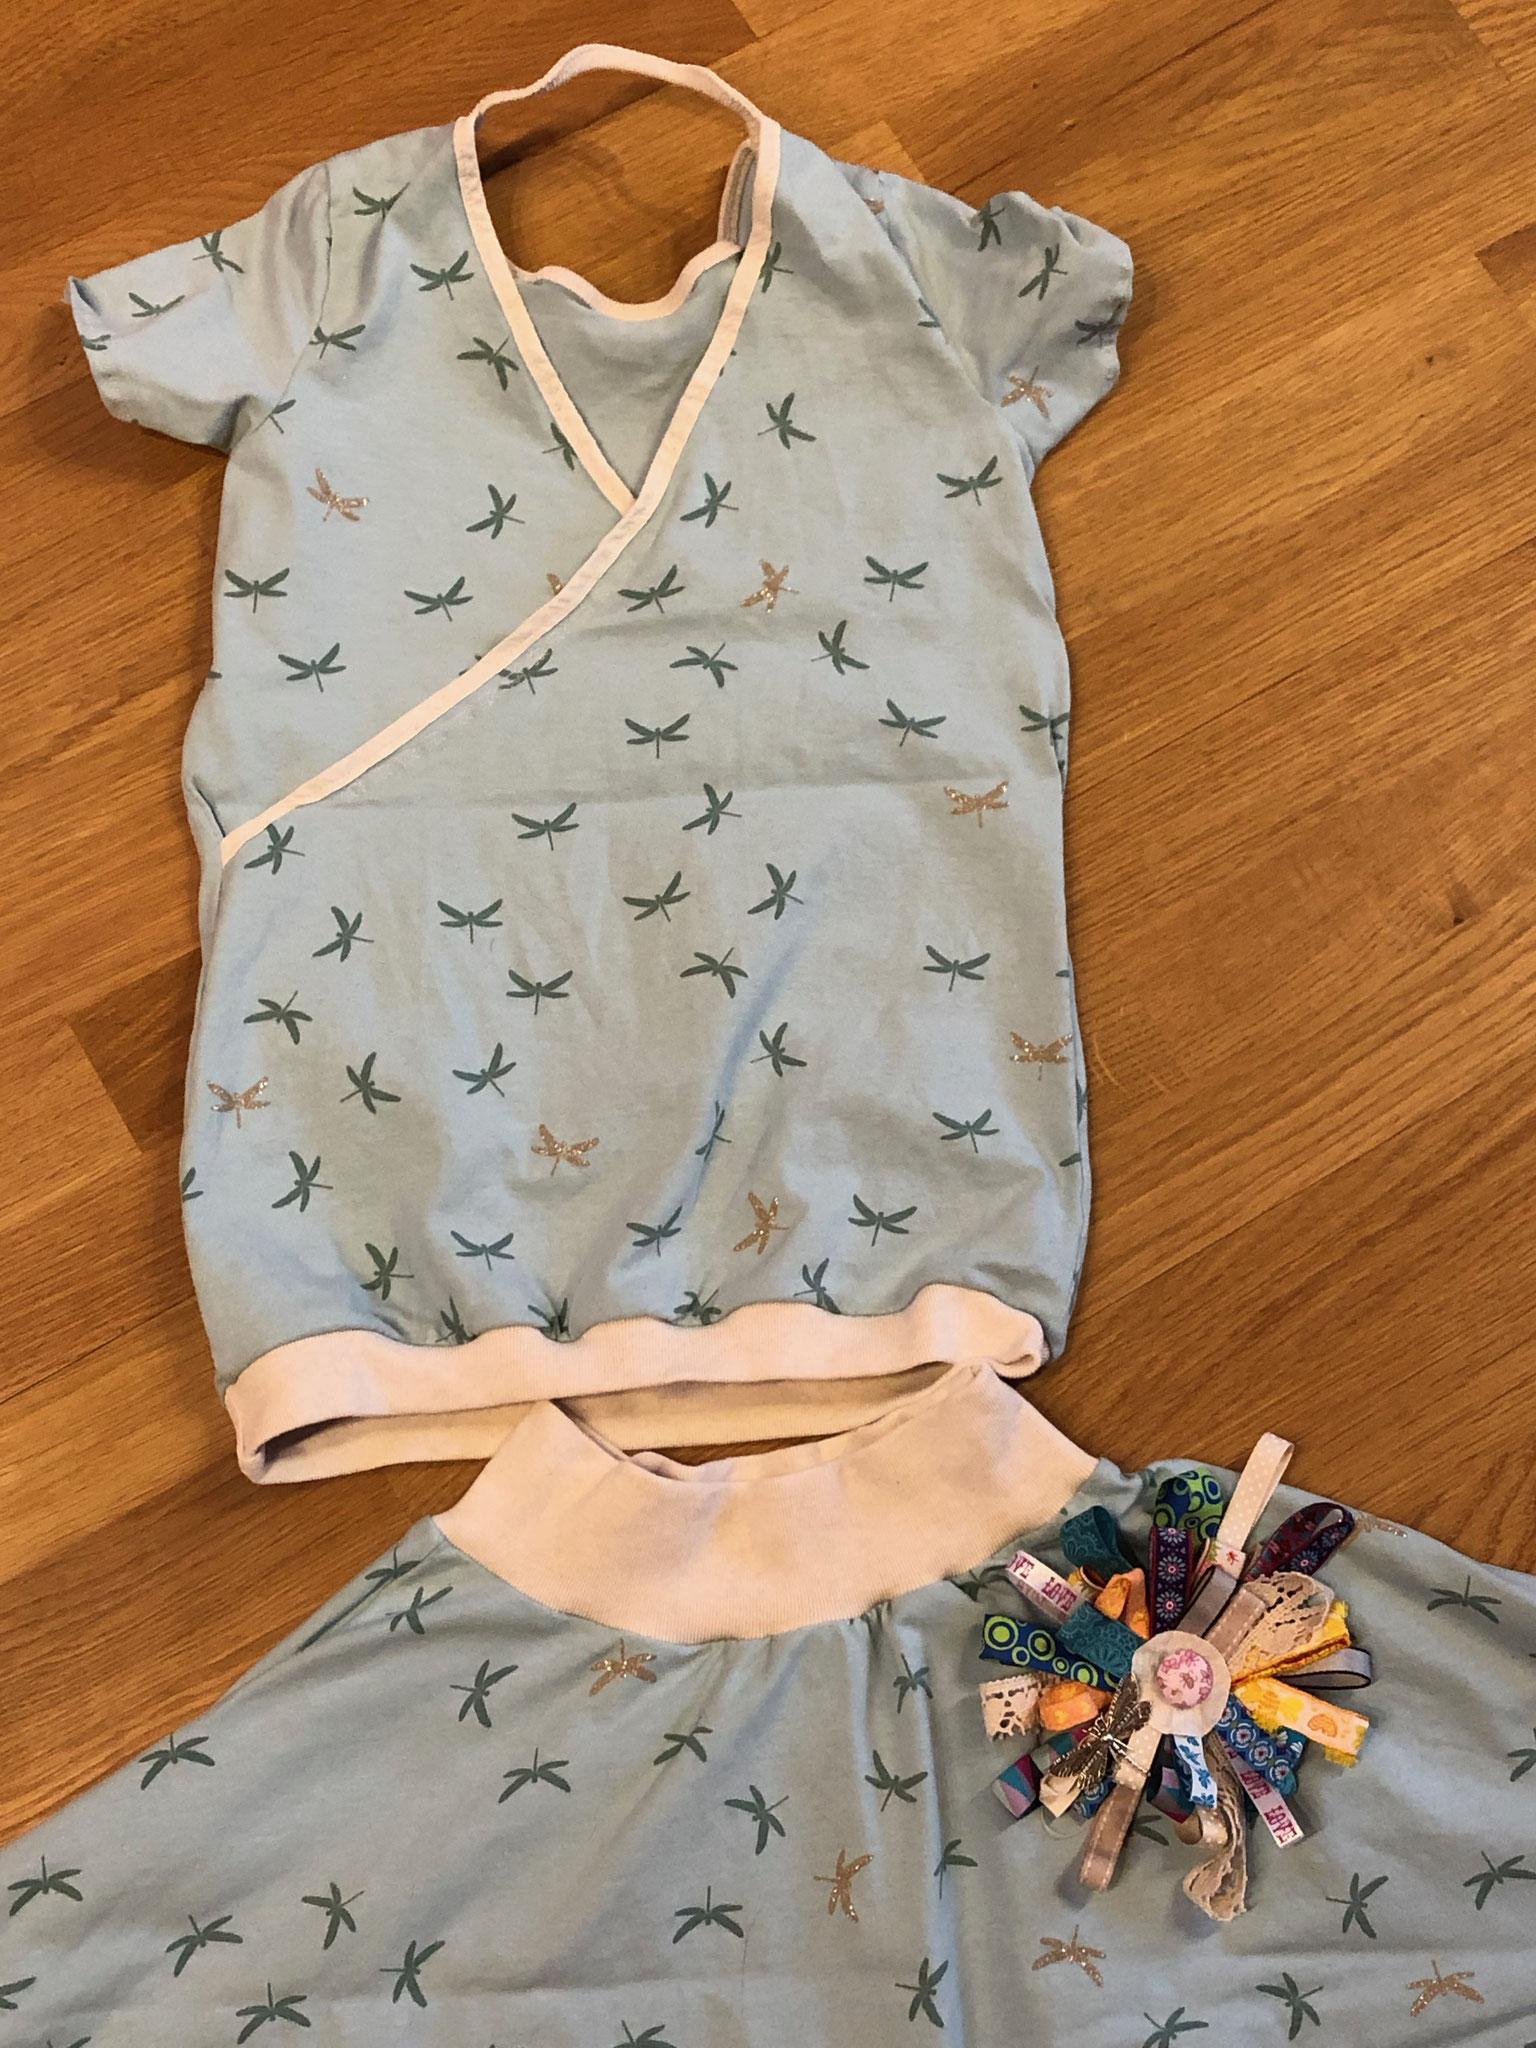 Libellen - Shirt mit überkreuztem Rückenausschnitt und Swing - Rock